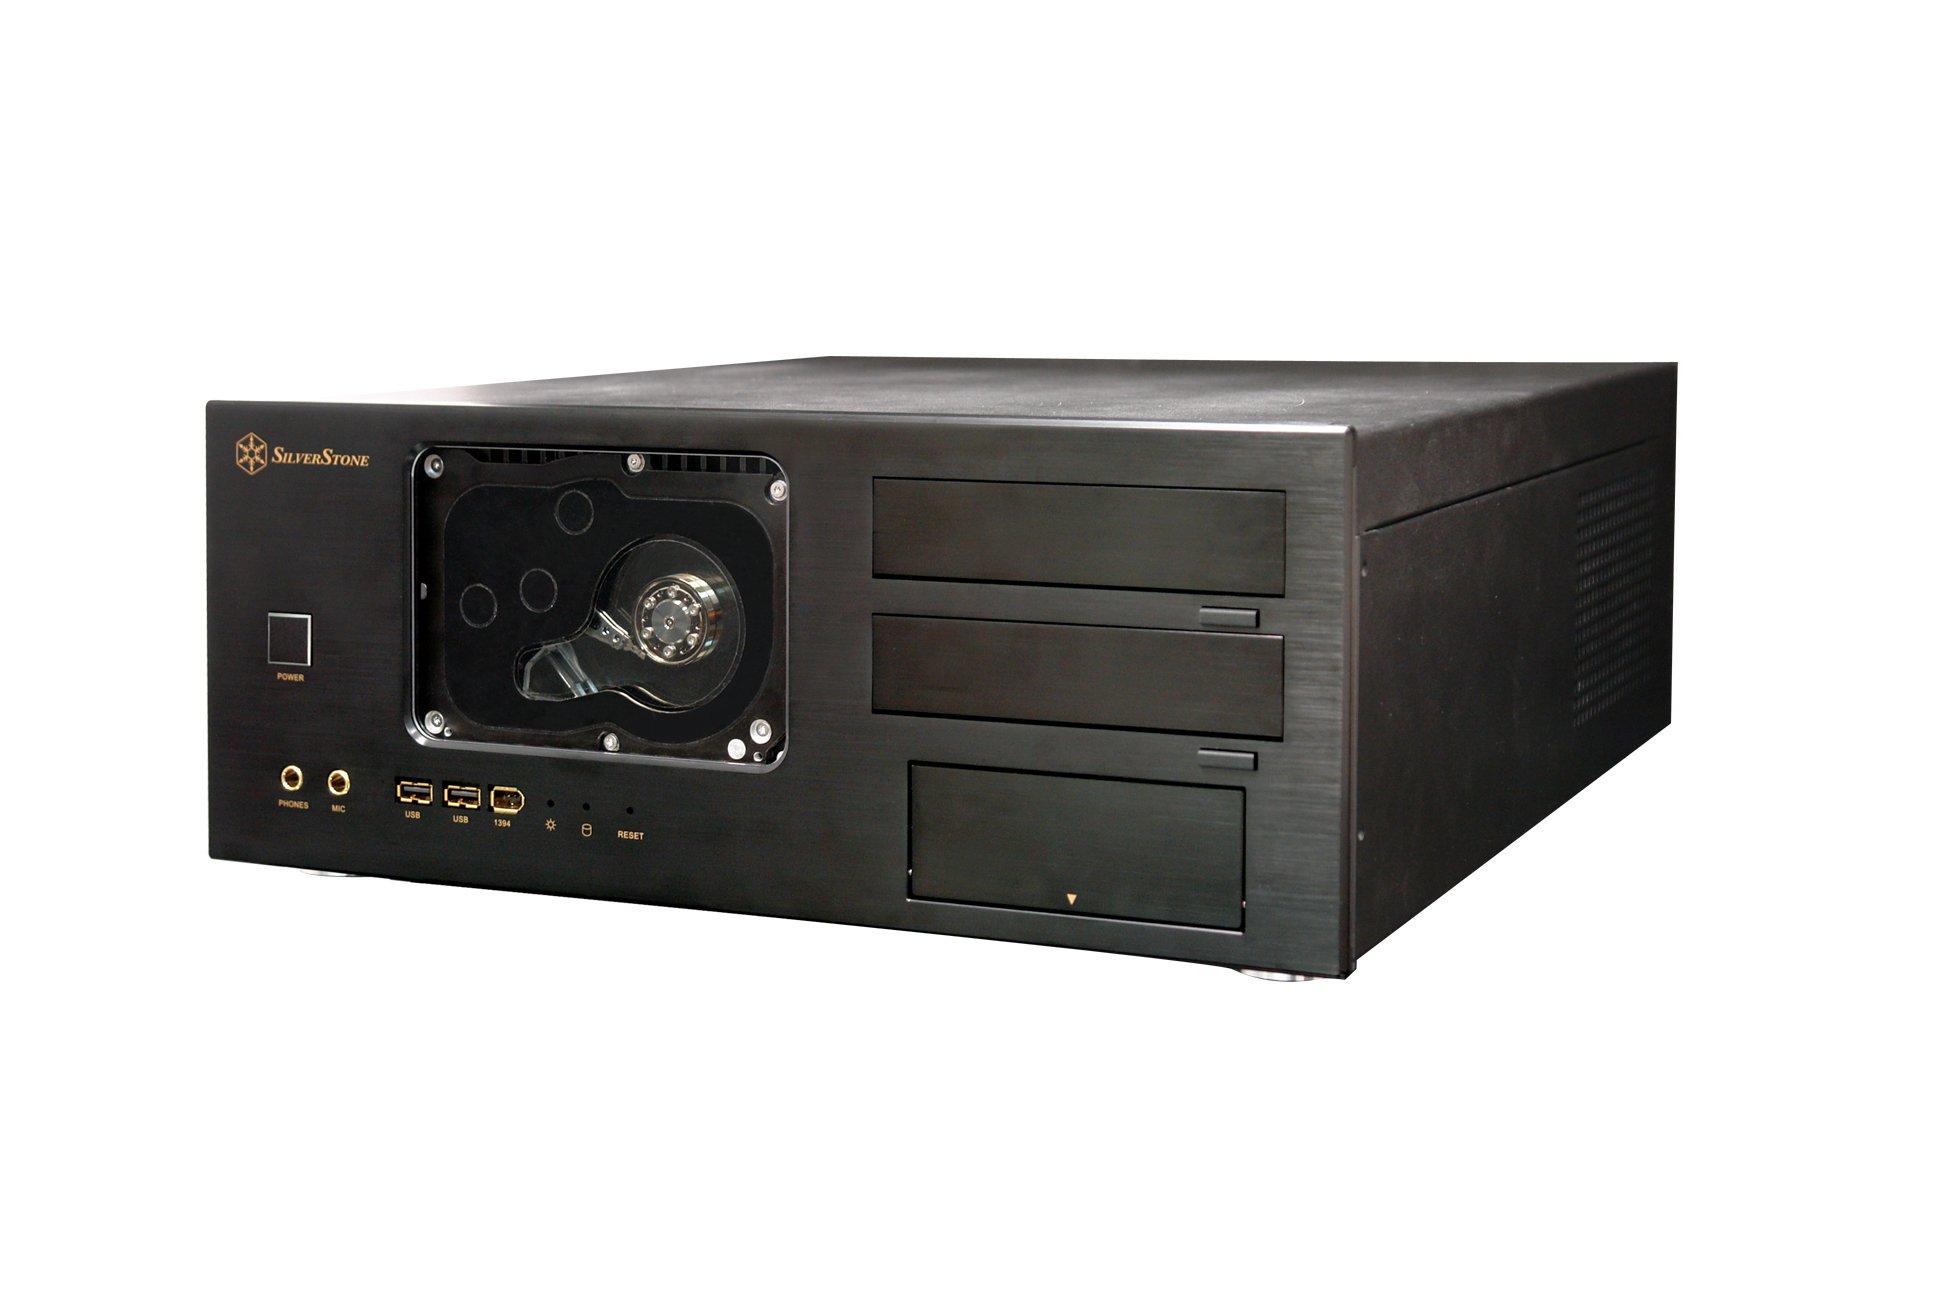 SilverStone CW01-B-WDR Aluminum ATX Media Center/HTPC Case - Retail (Black) by SilverStone Technology